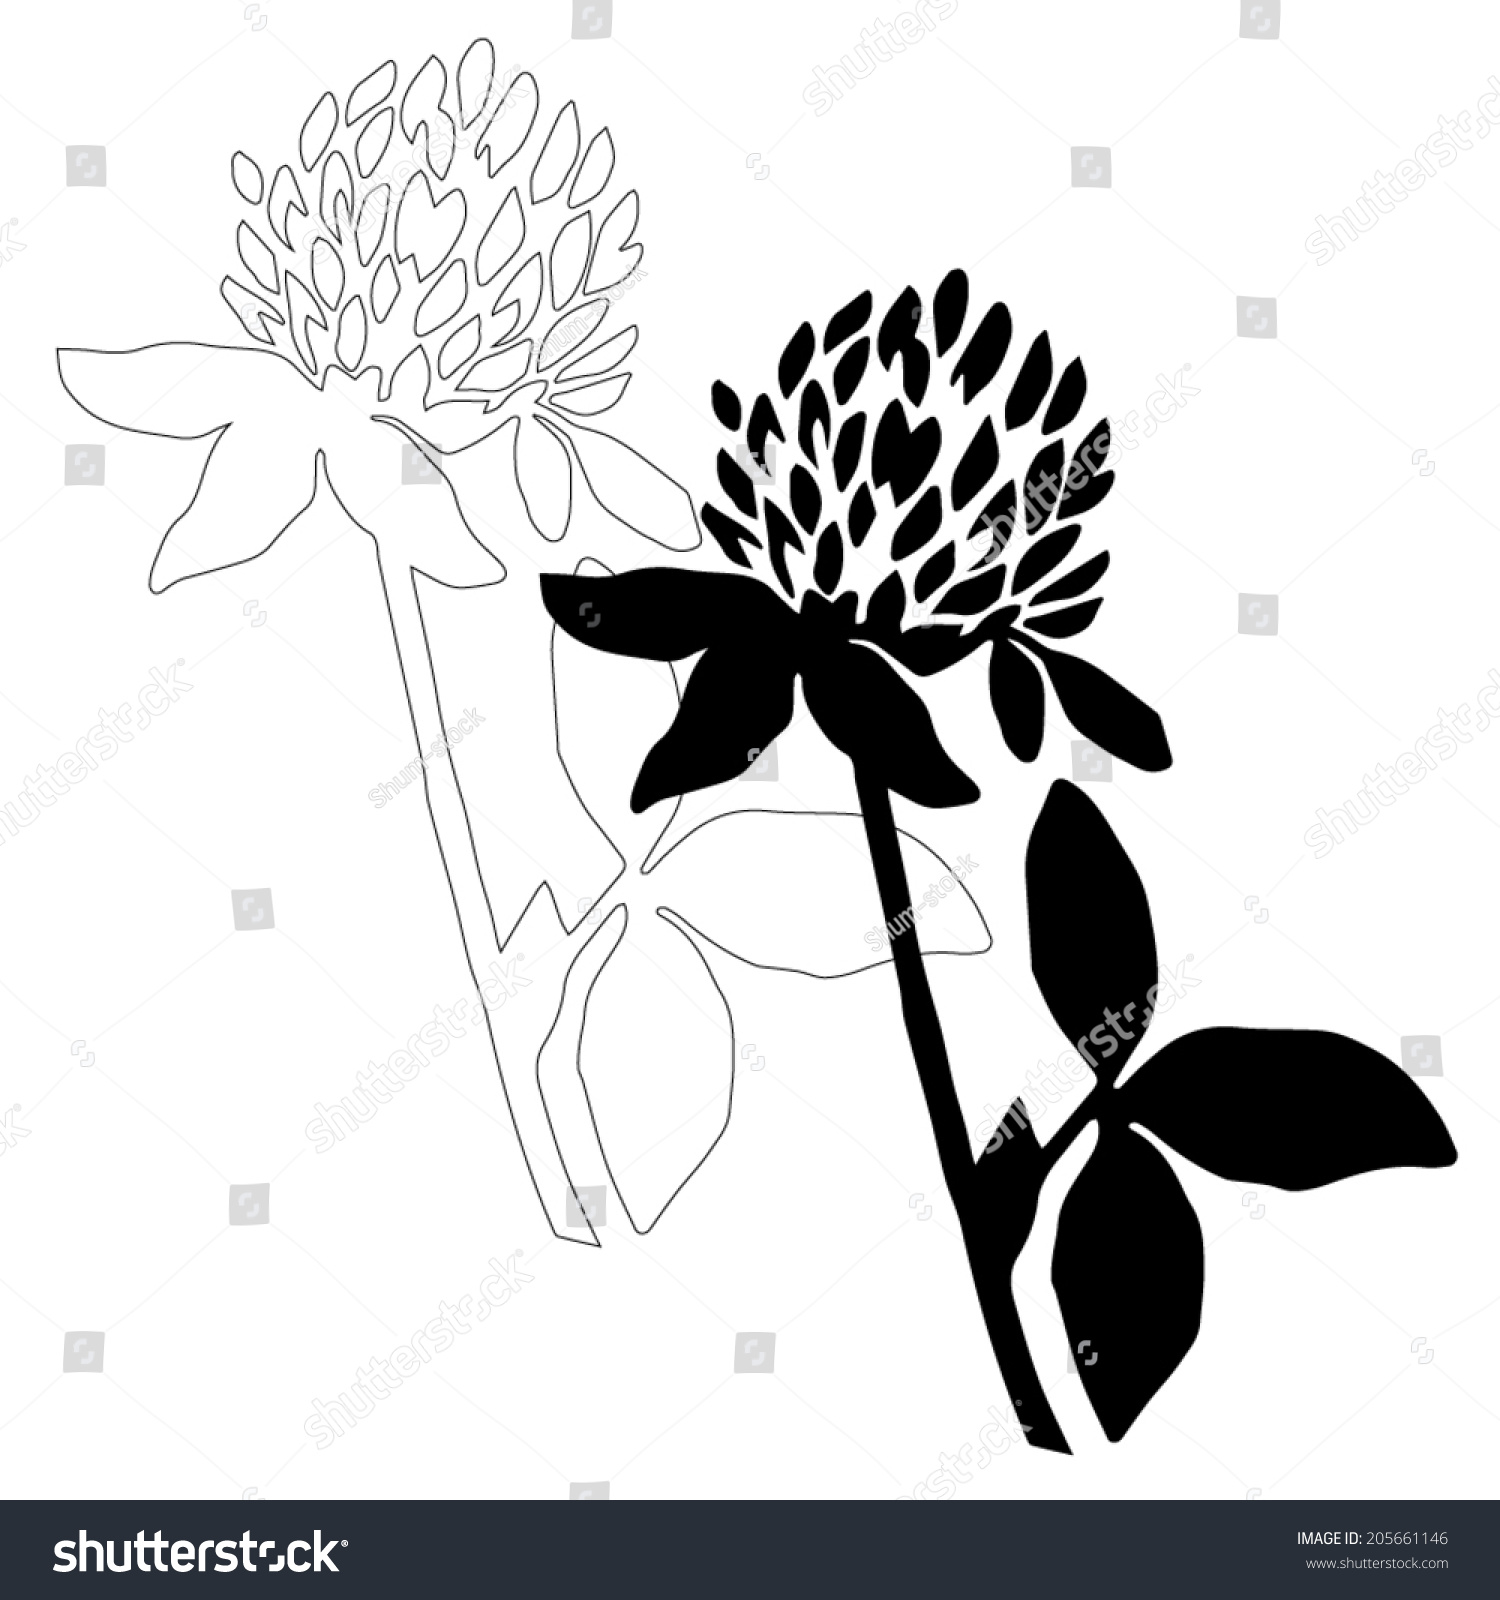 Black clover flower isolated on white background simple botanical illustrations set hand drawn sketch